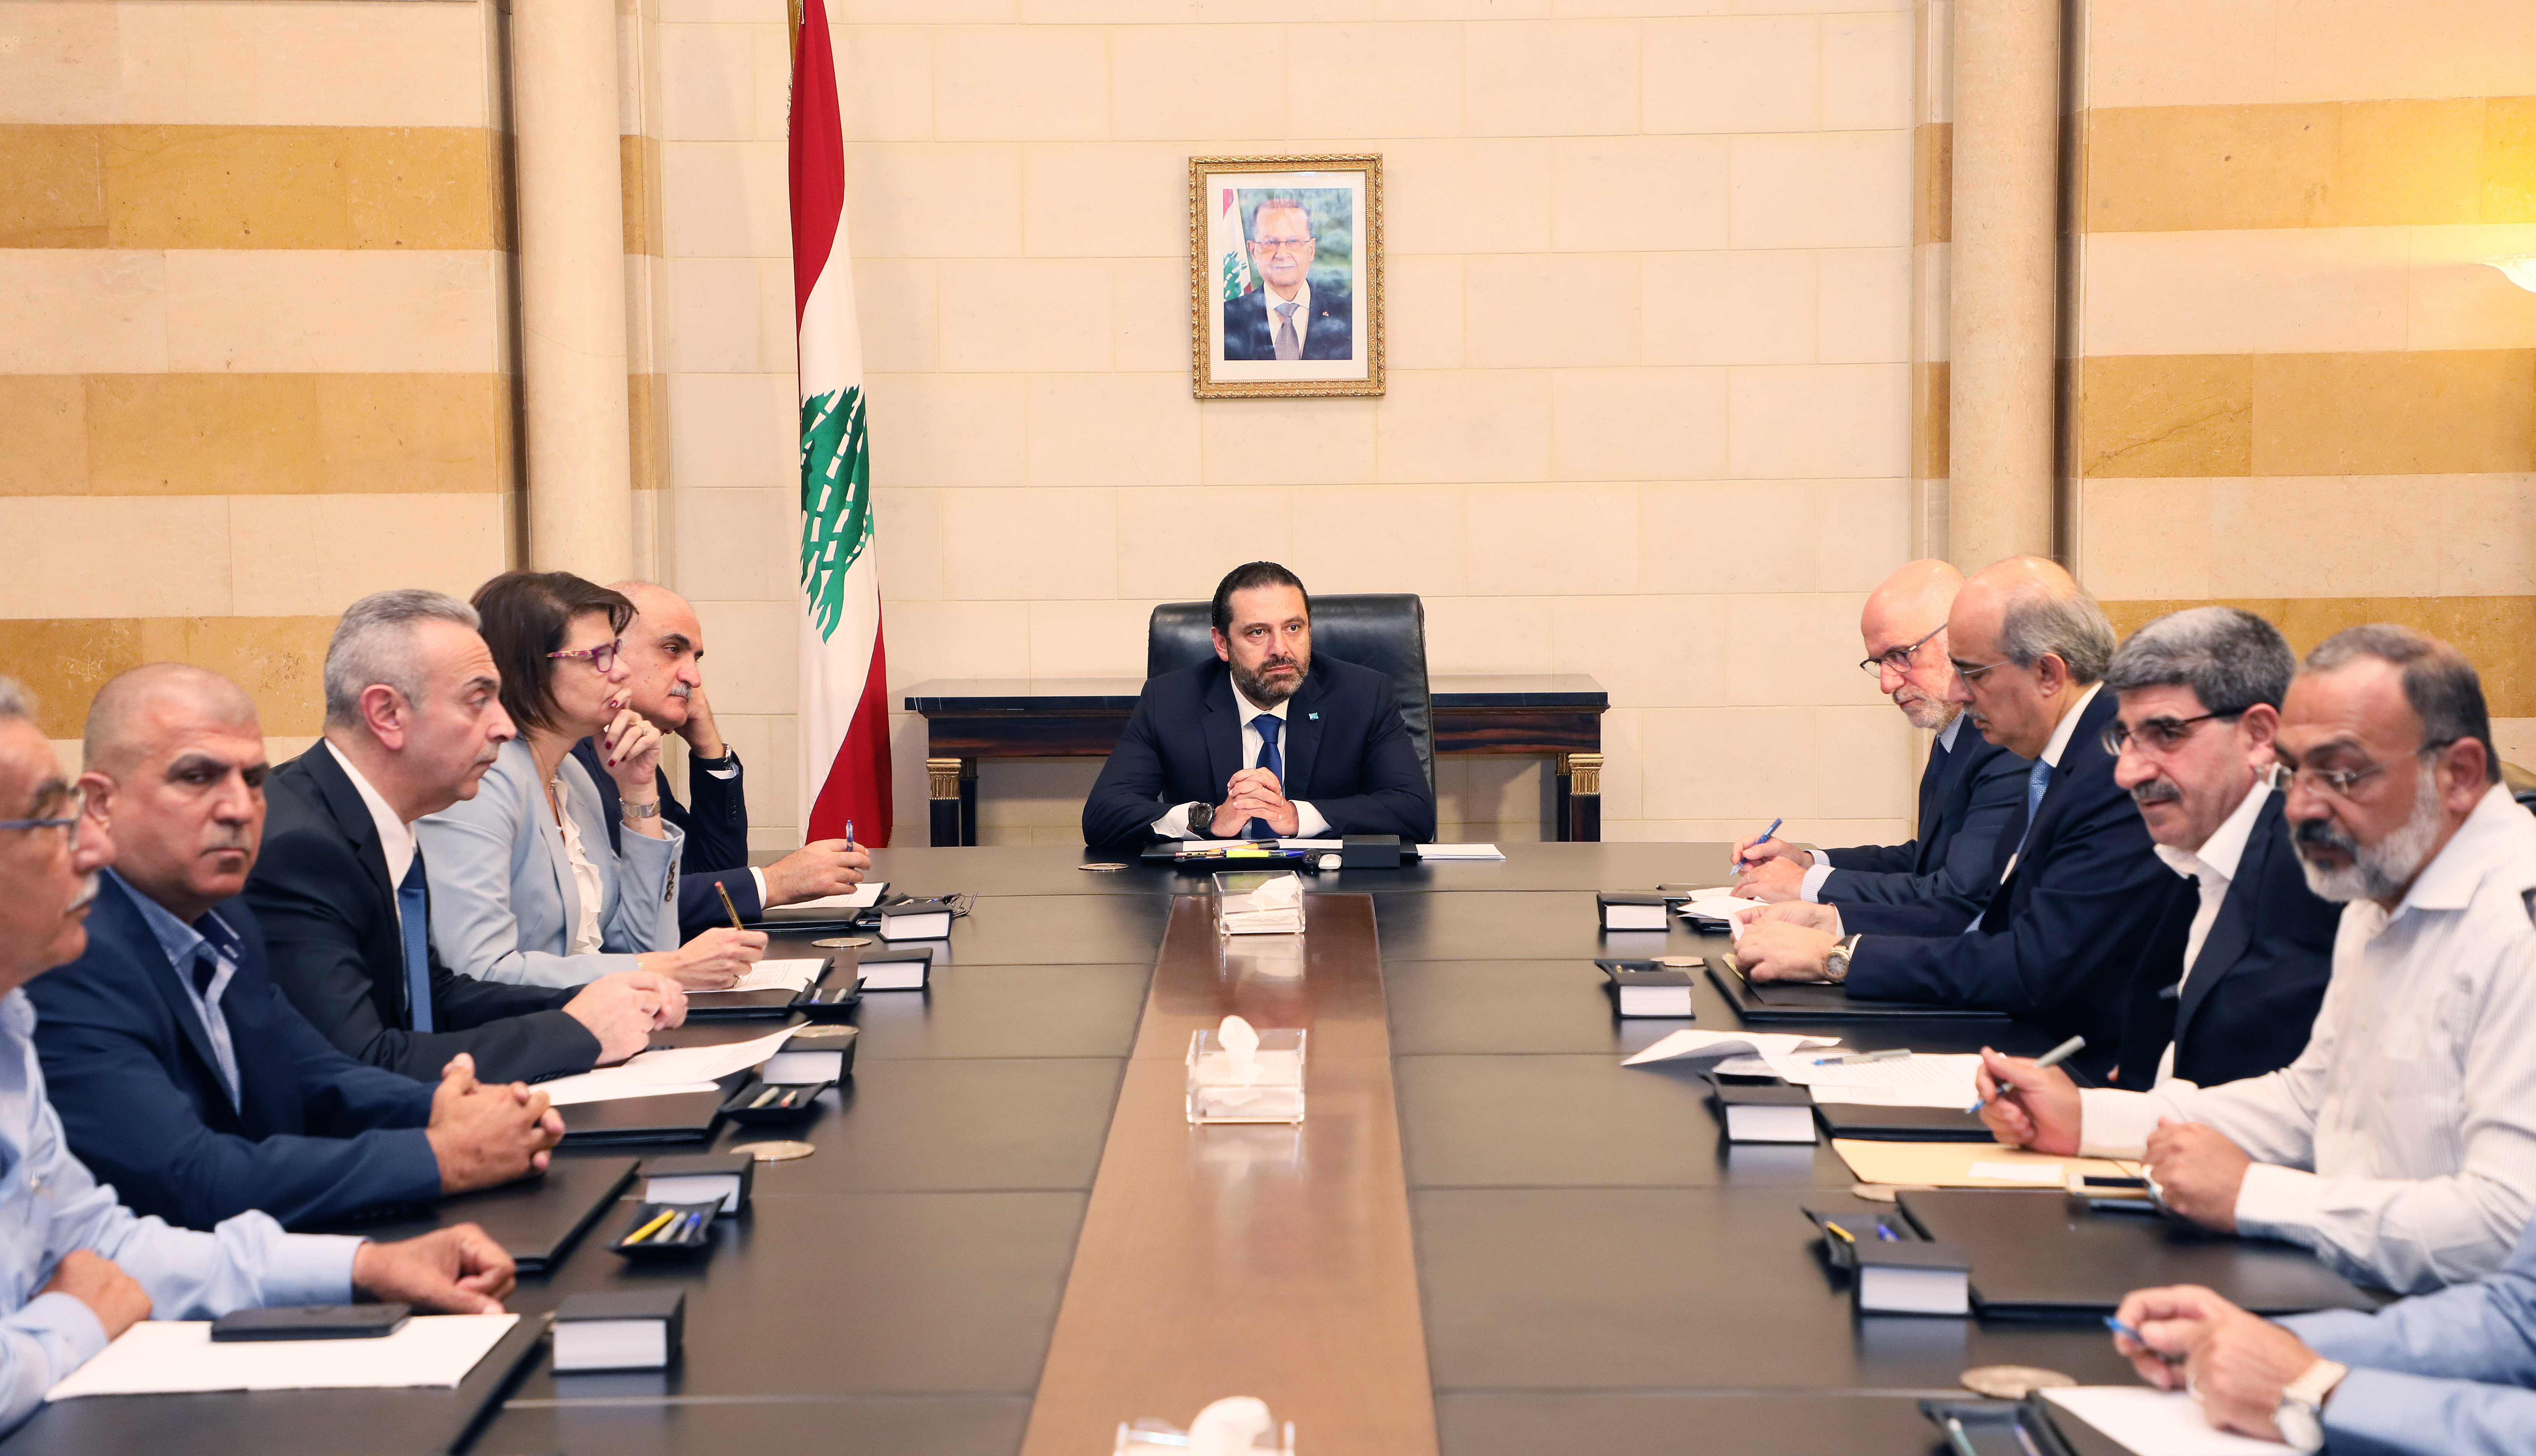 Pr Minister Saad Hariri Heading a Ministerial Council (2)